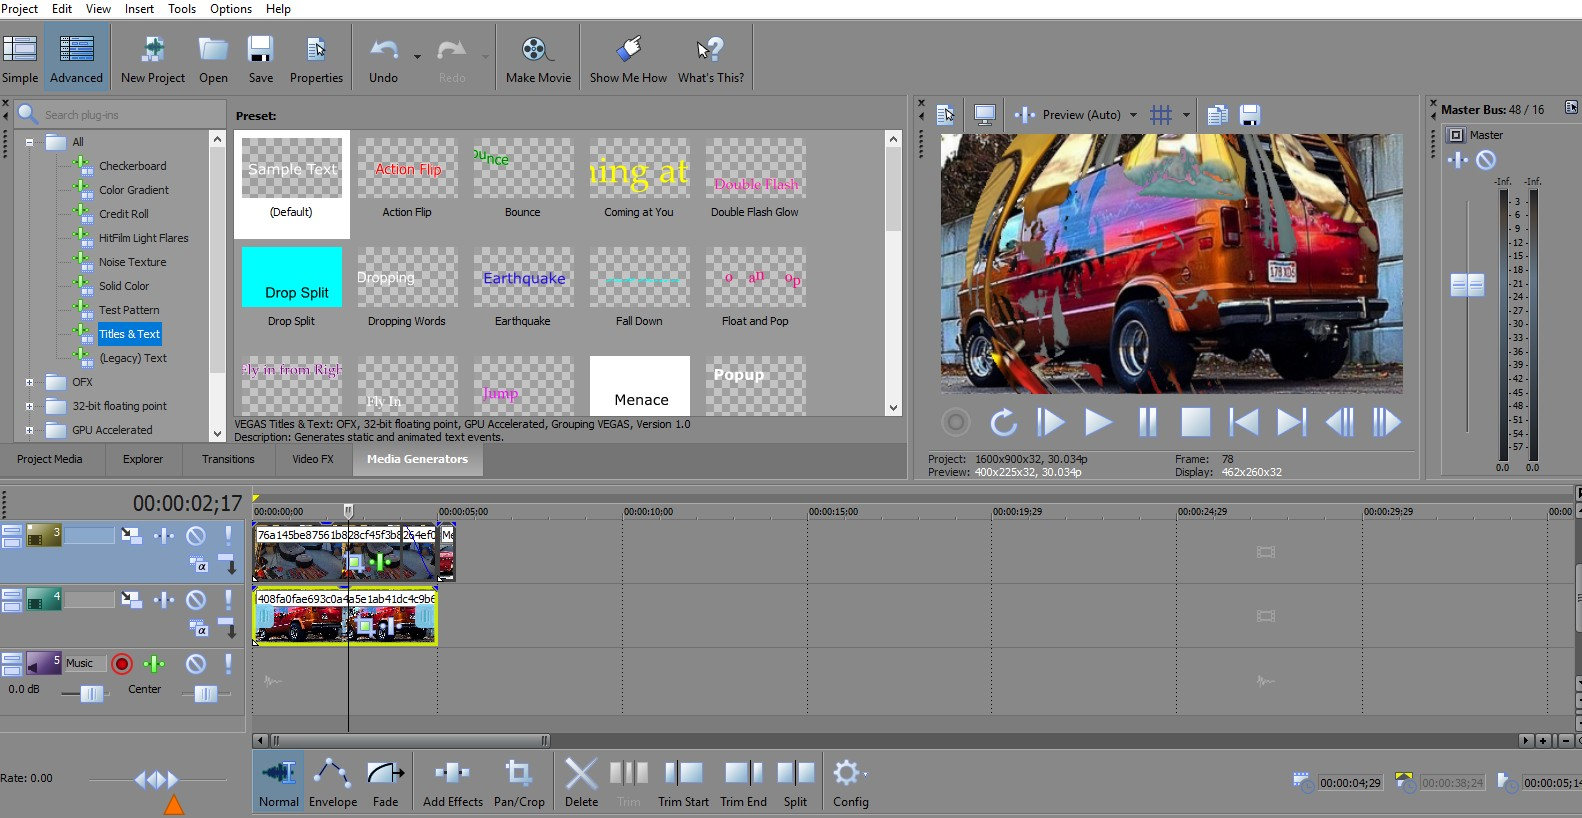 Movie Studio Platinum - Shortcuts, Hotkeys, and Tools